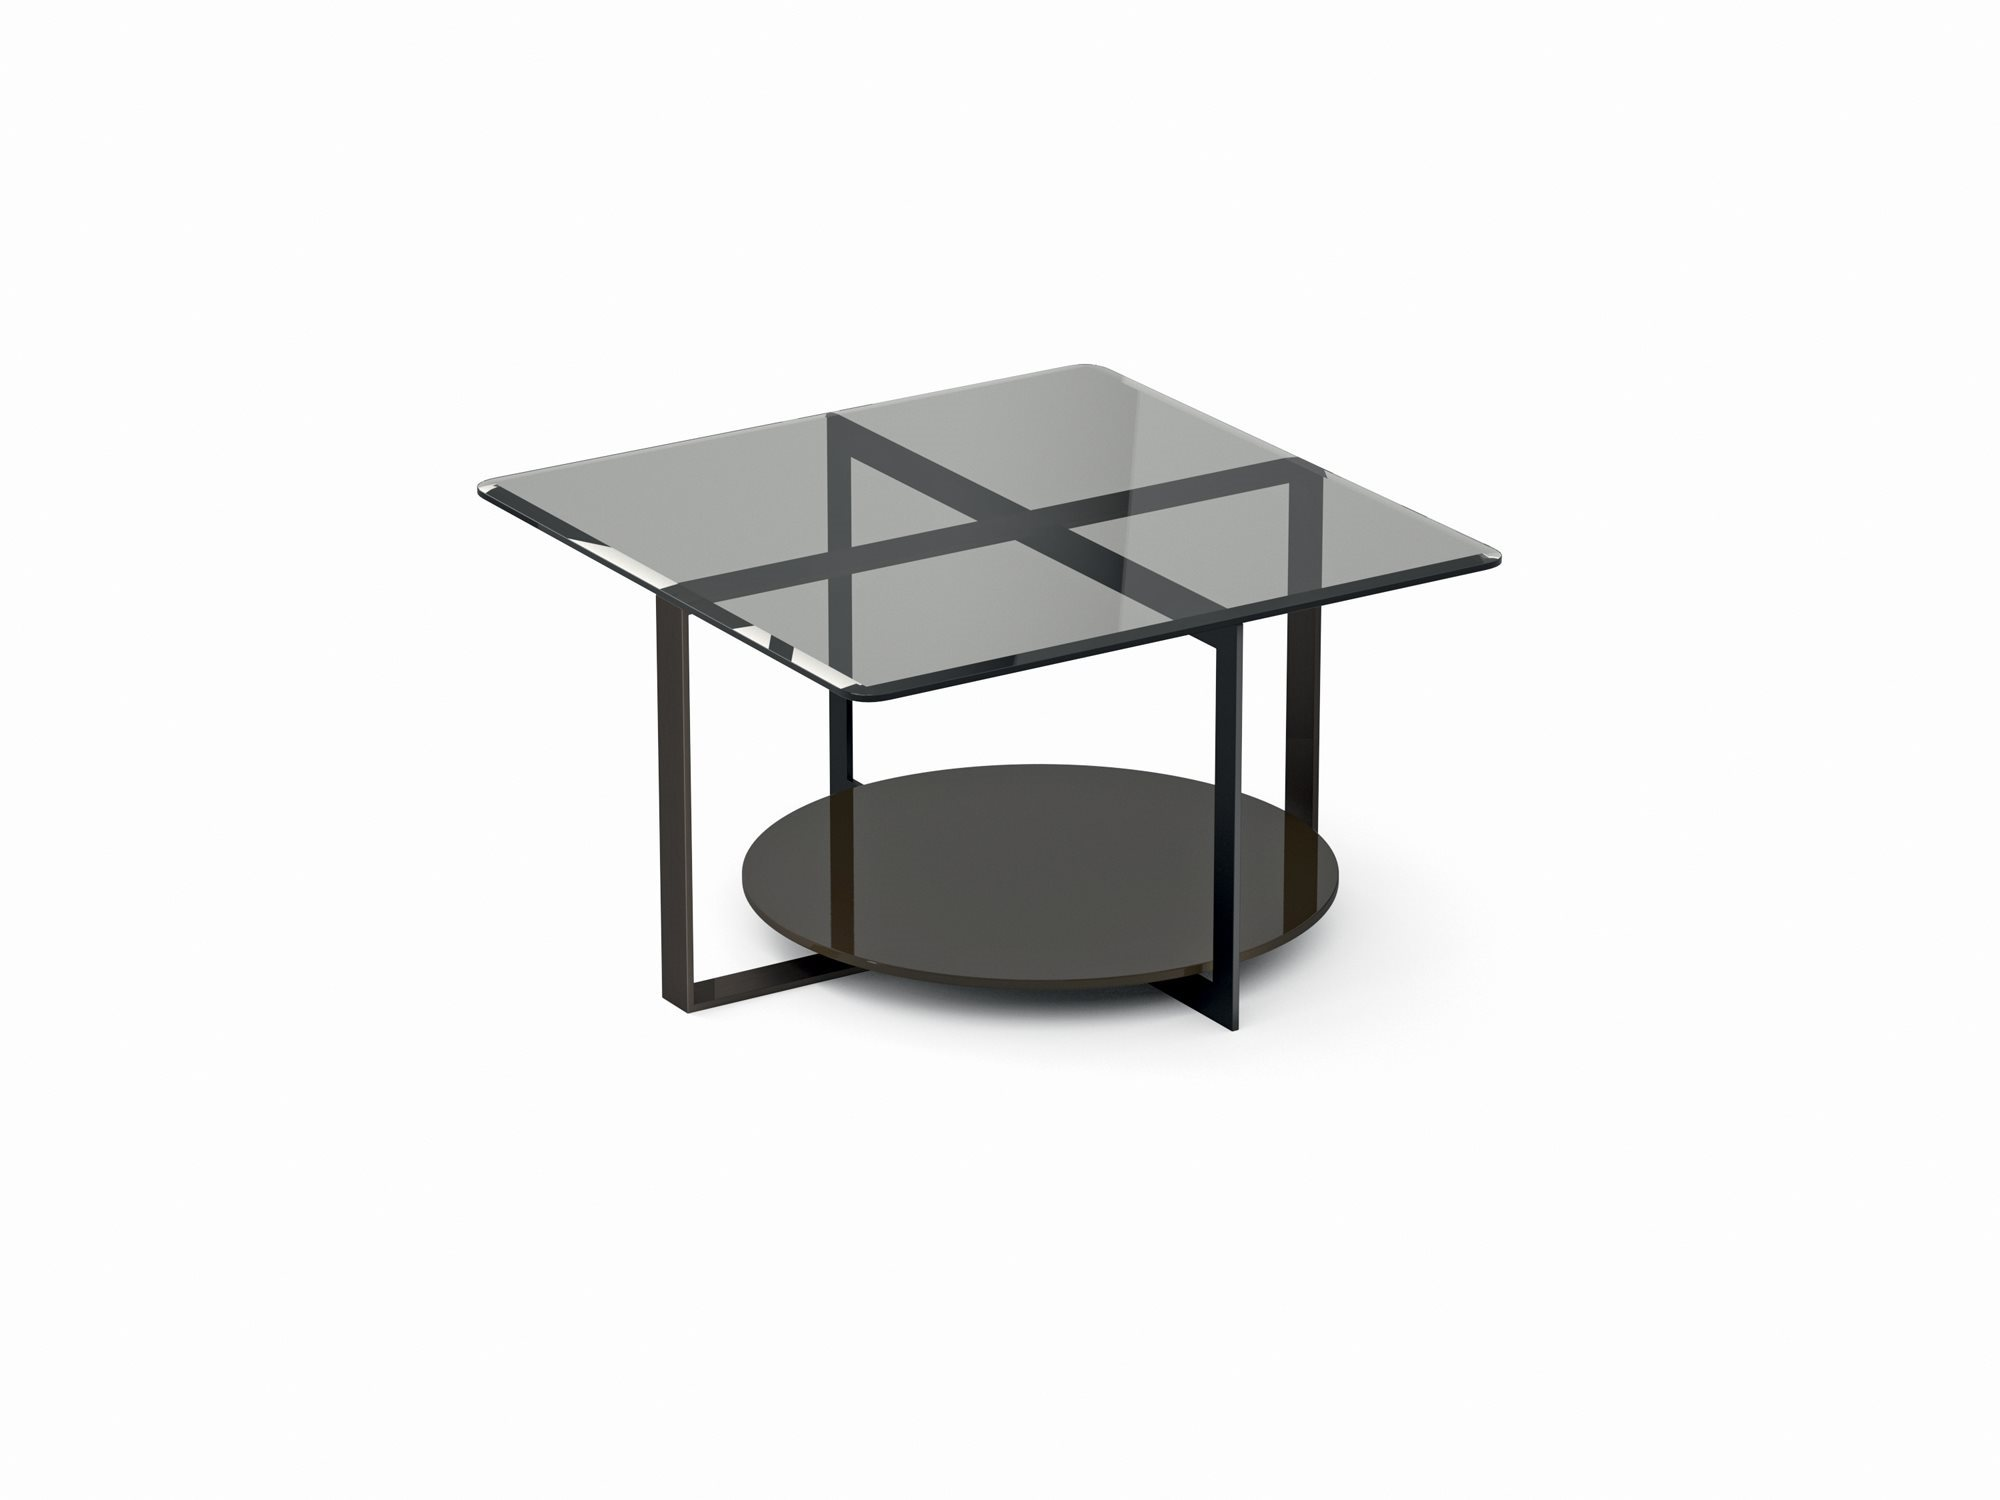 Alberta Salotti Кофейный столик Clint от итальянского бренда Alberta